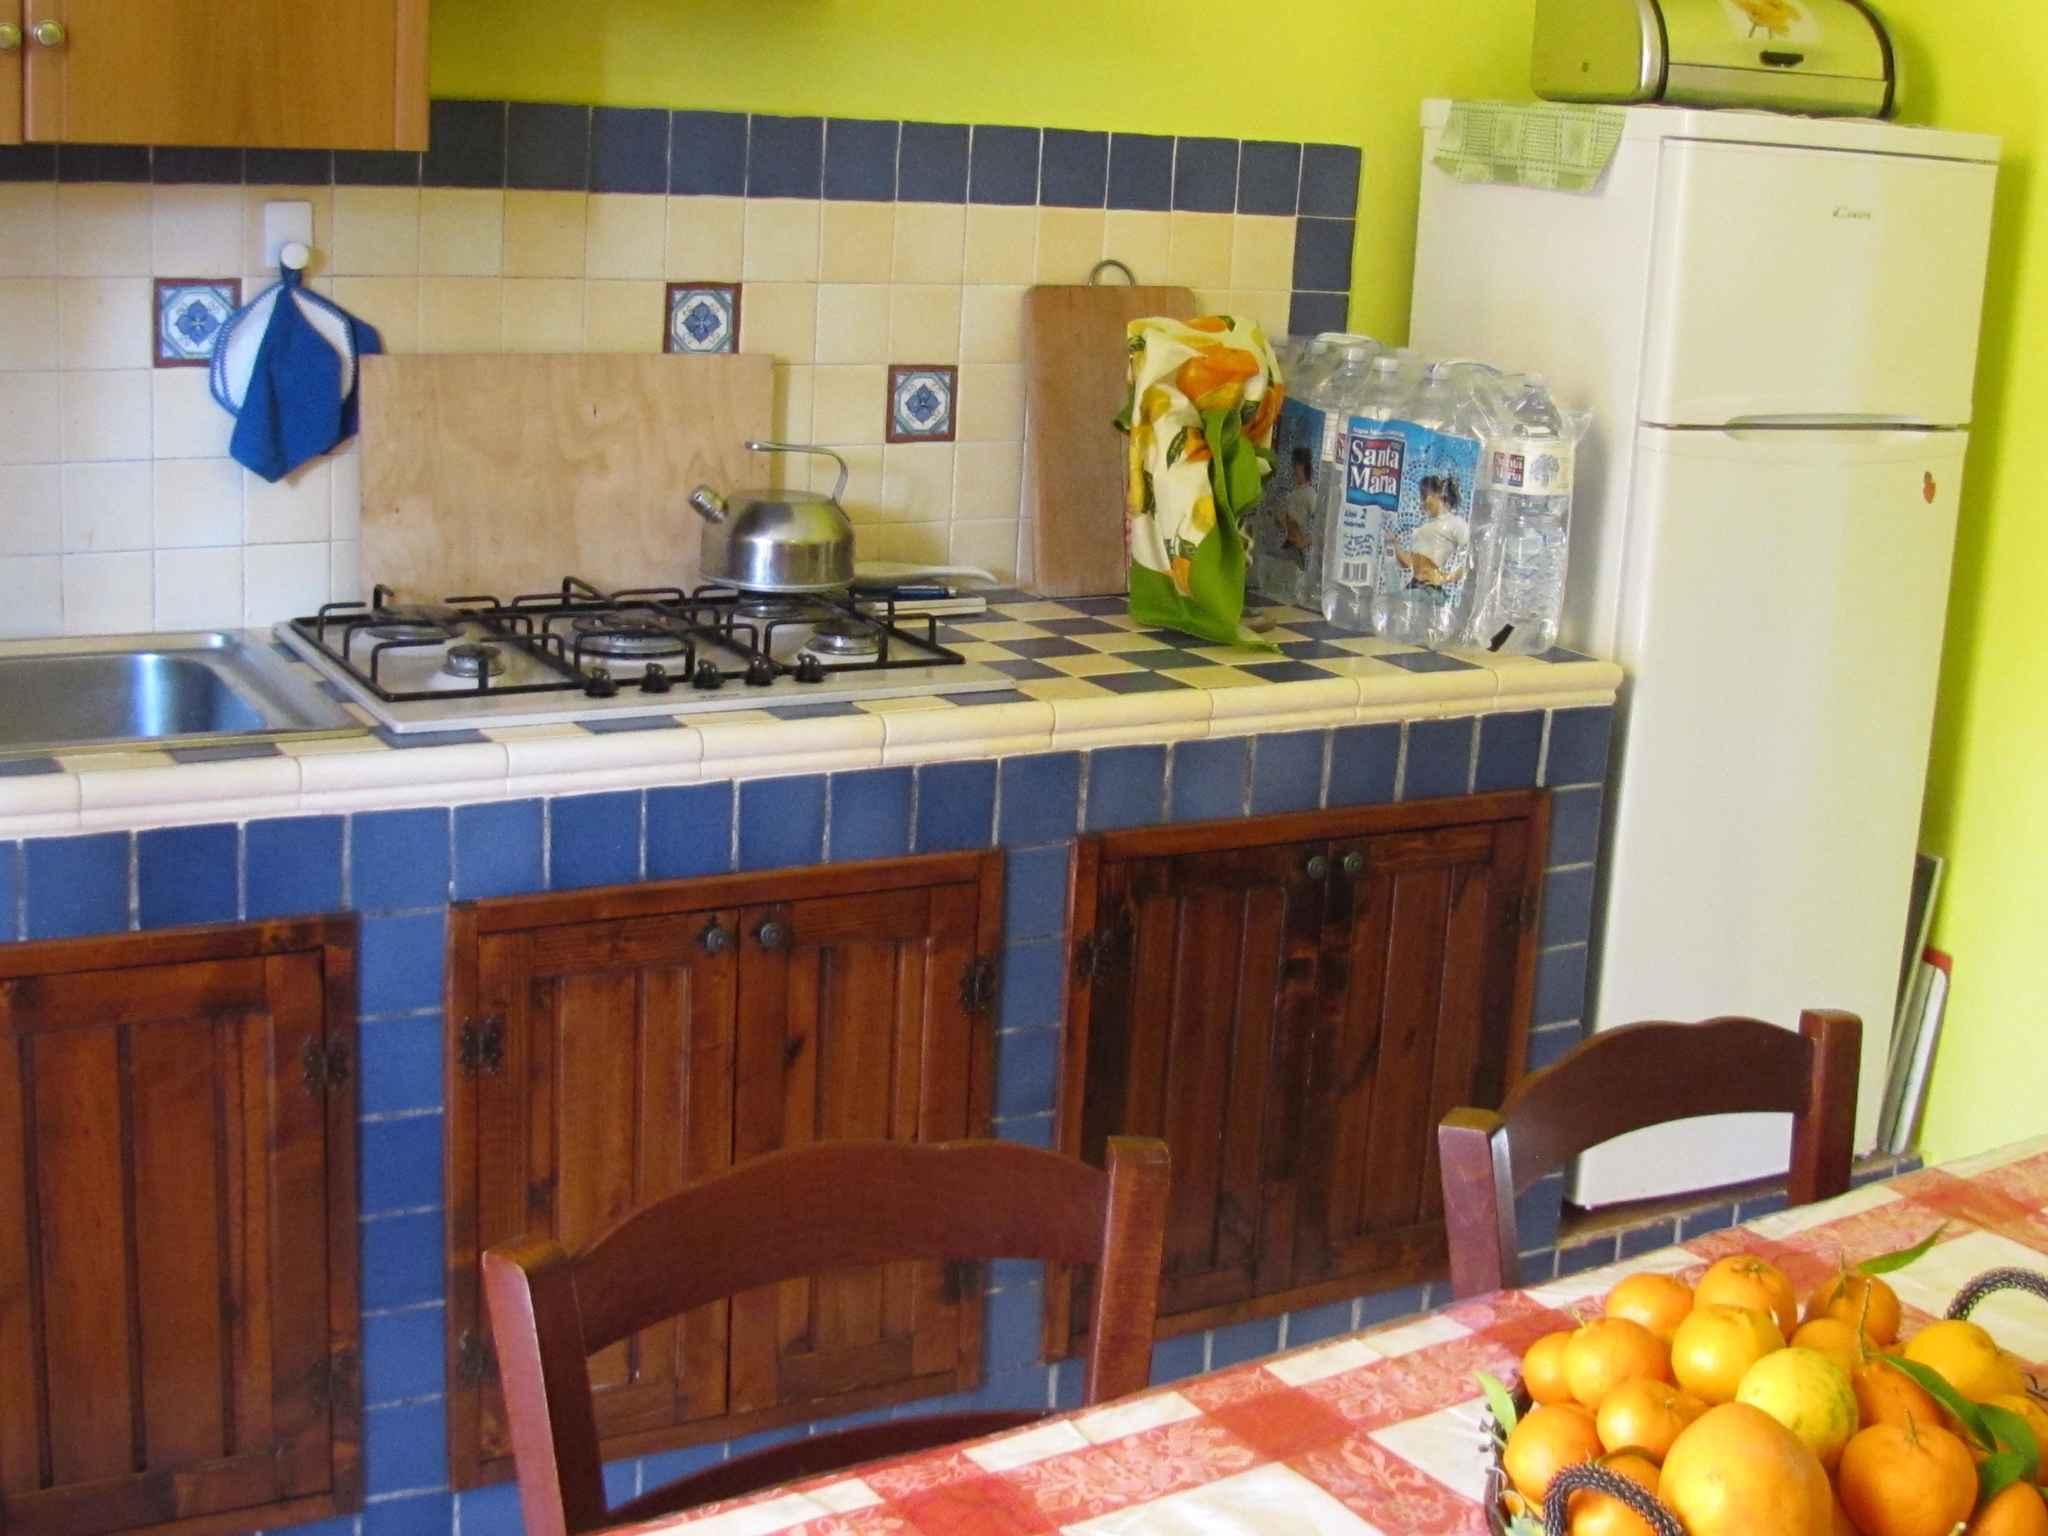 Maison de vacances mit Blick auf Zitronengarten (317534), Lido di Noto, Siracusa, Sicile, Italie, image 18